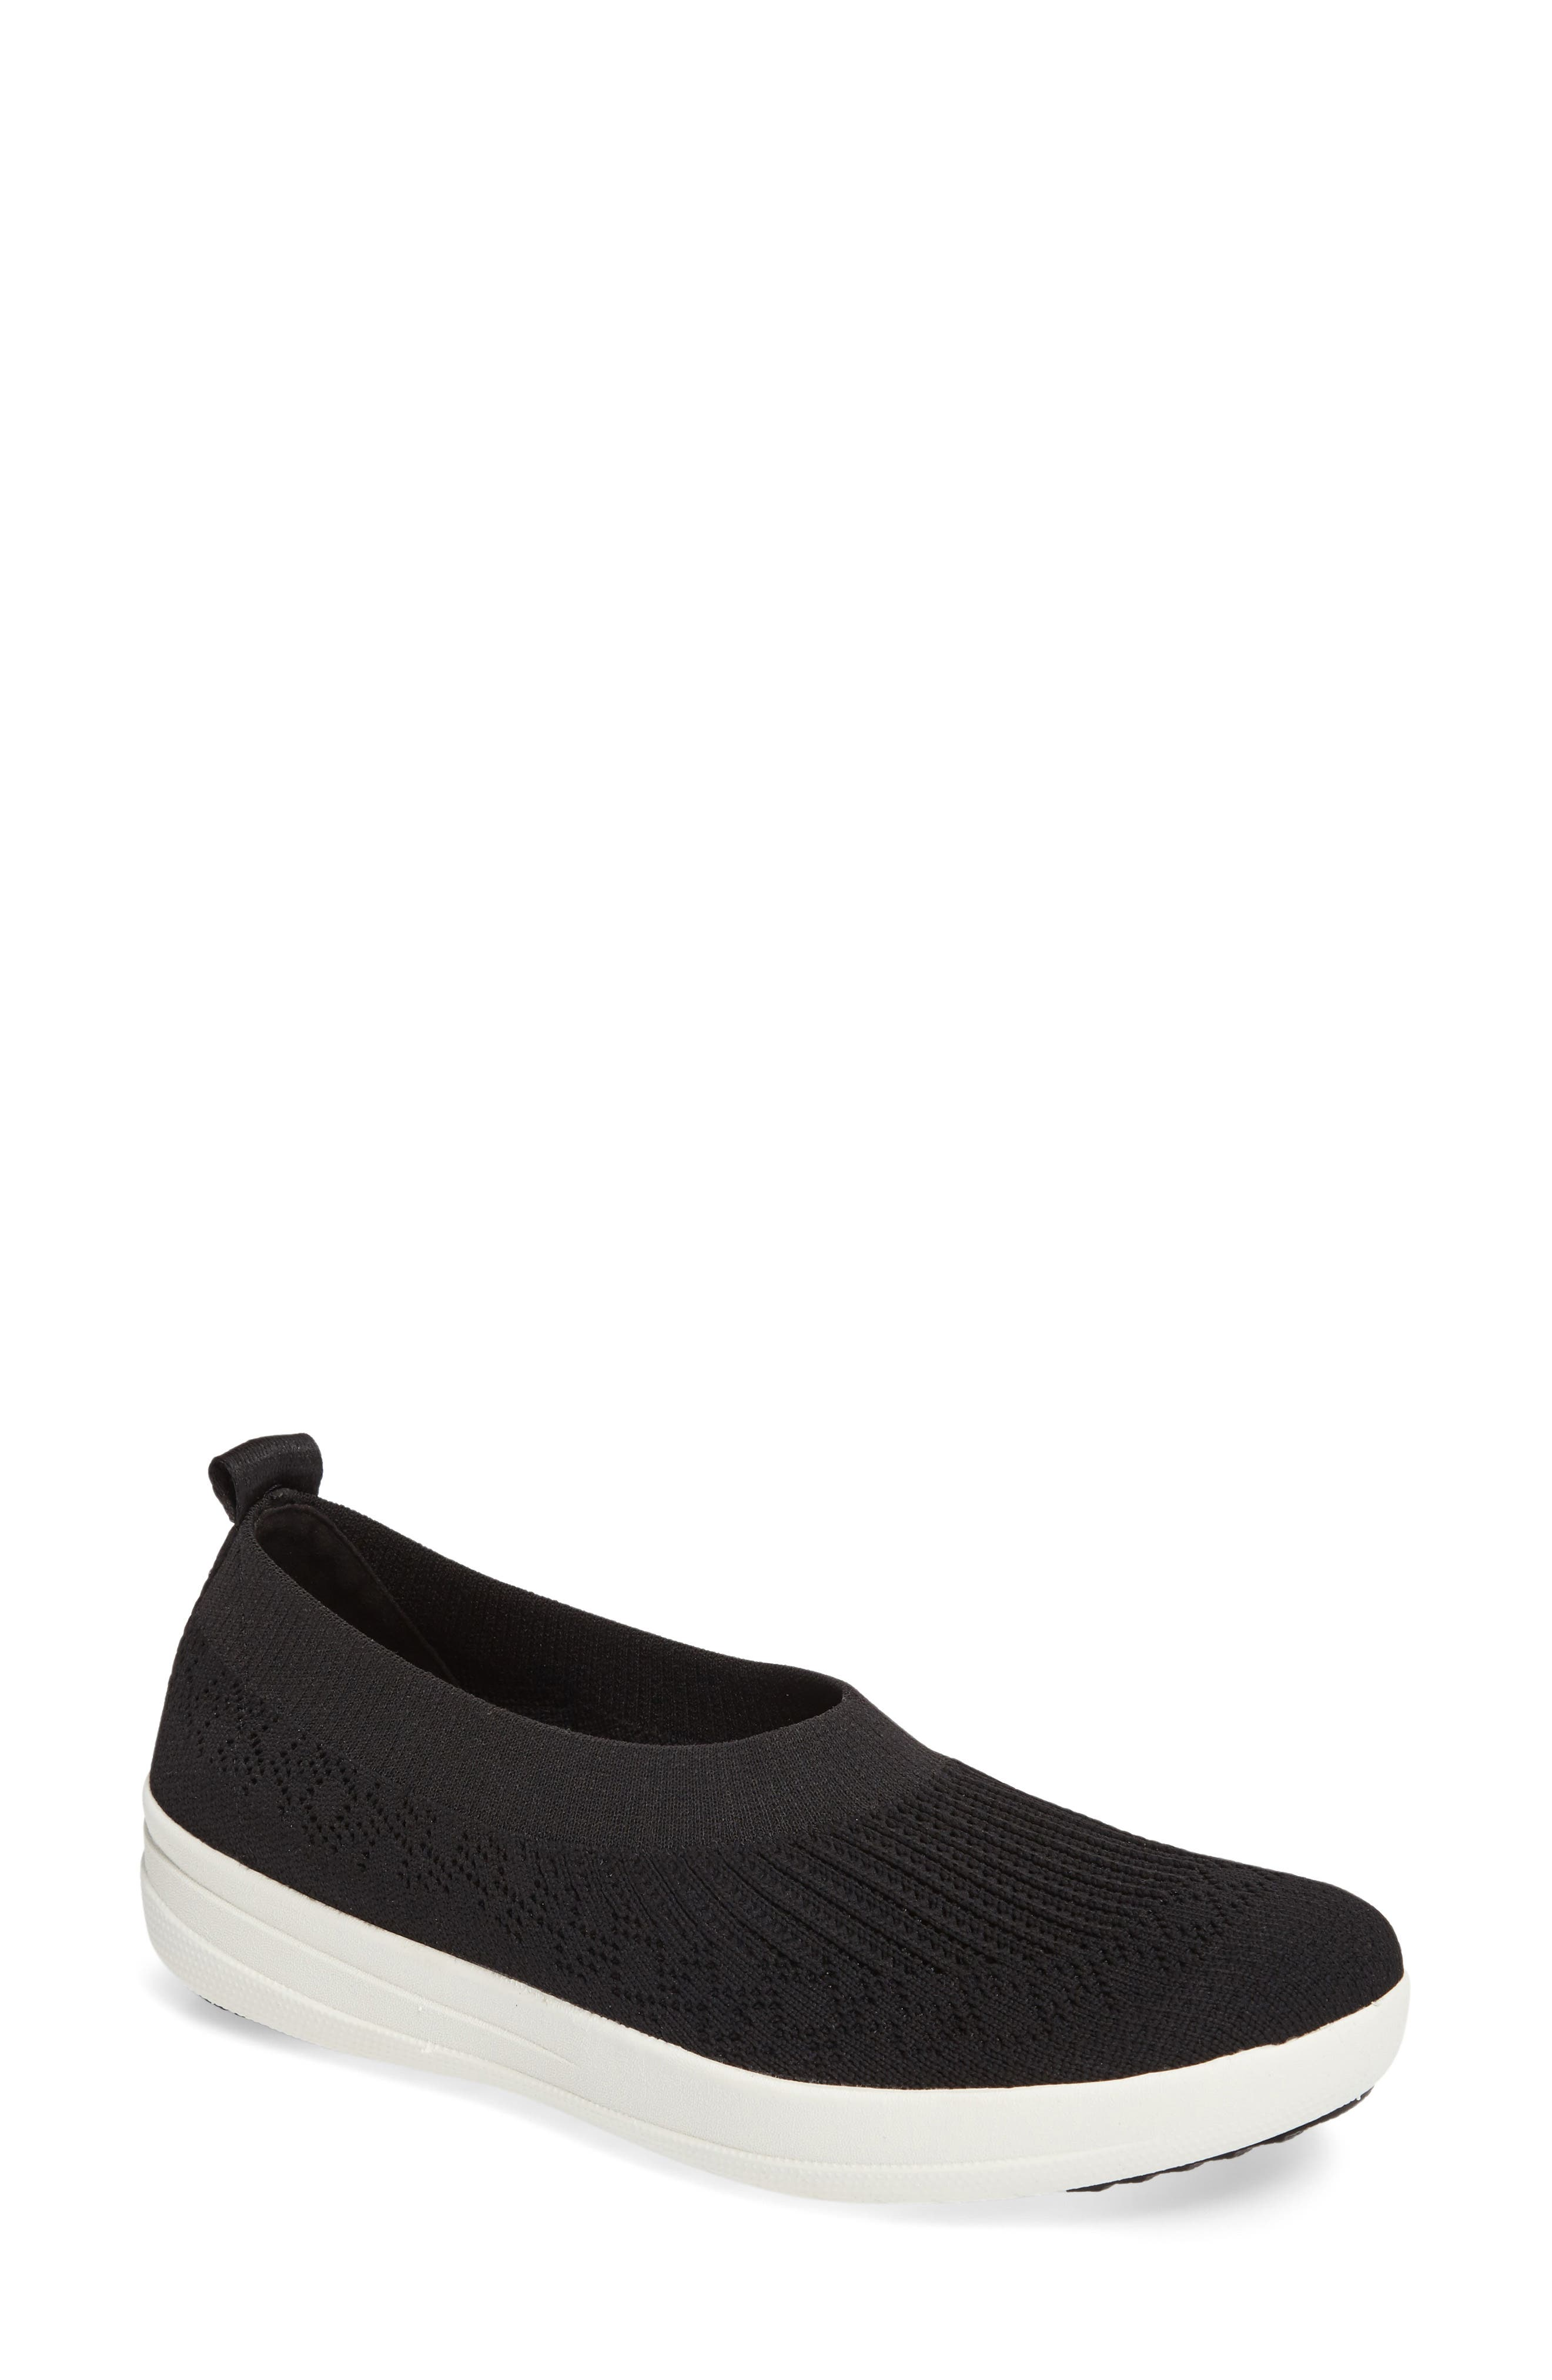 FITFLOP, Uberknit Slip-On Sneaker, Main thumbnail 1, color, BLACK FABRIC